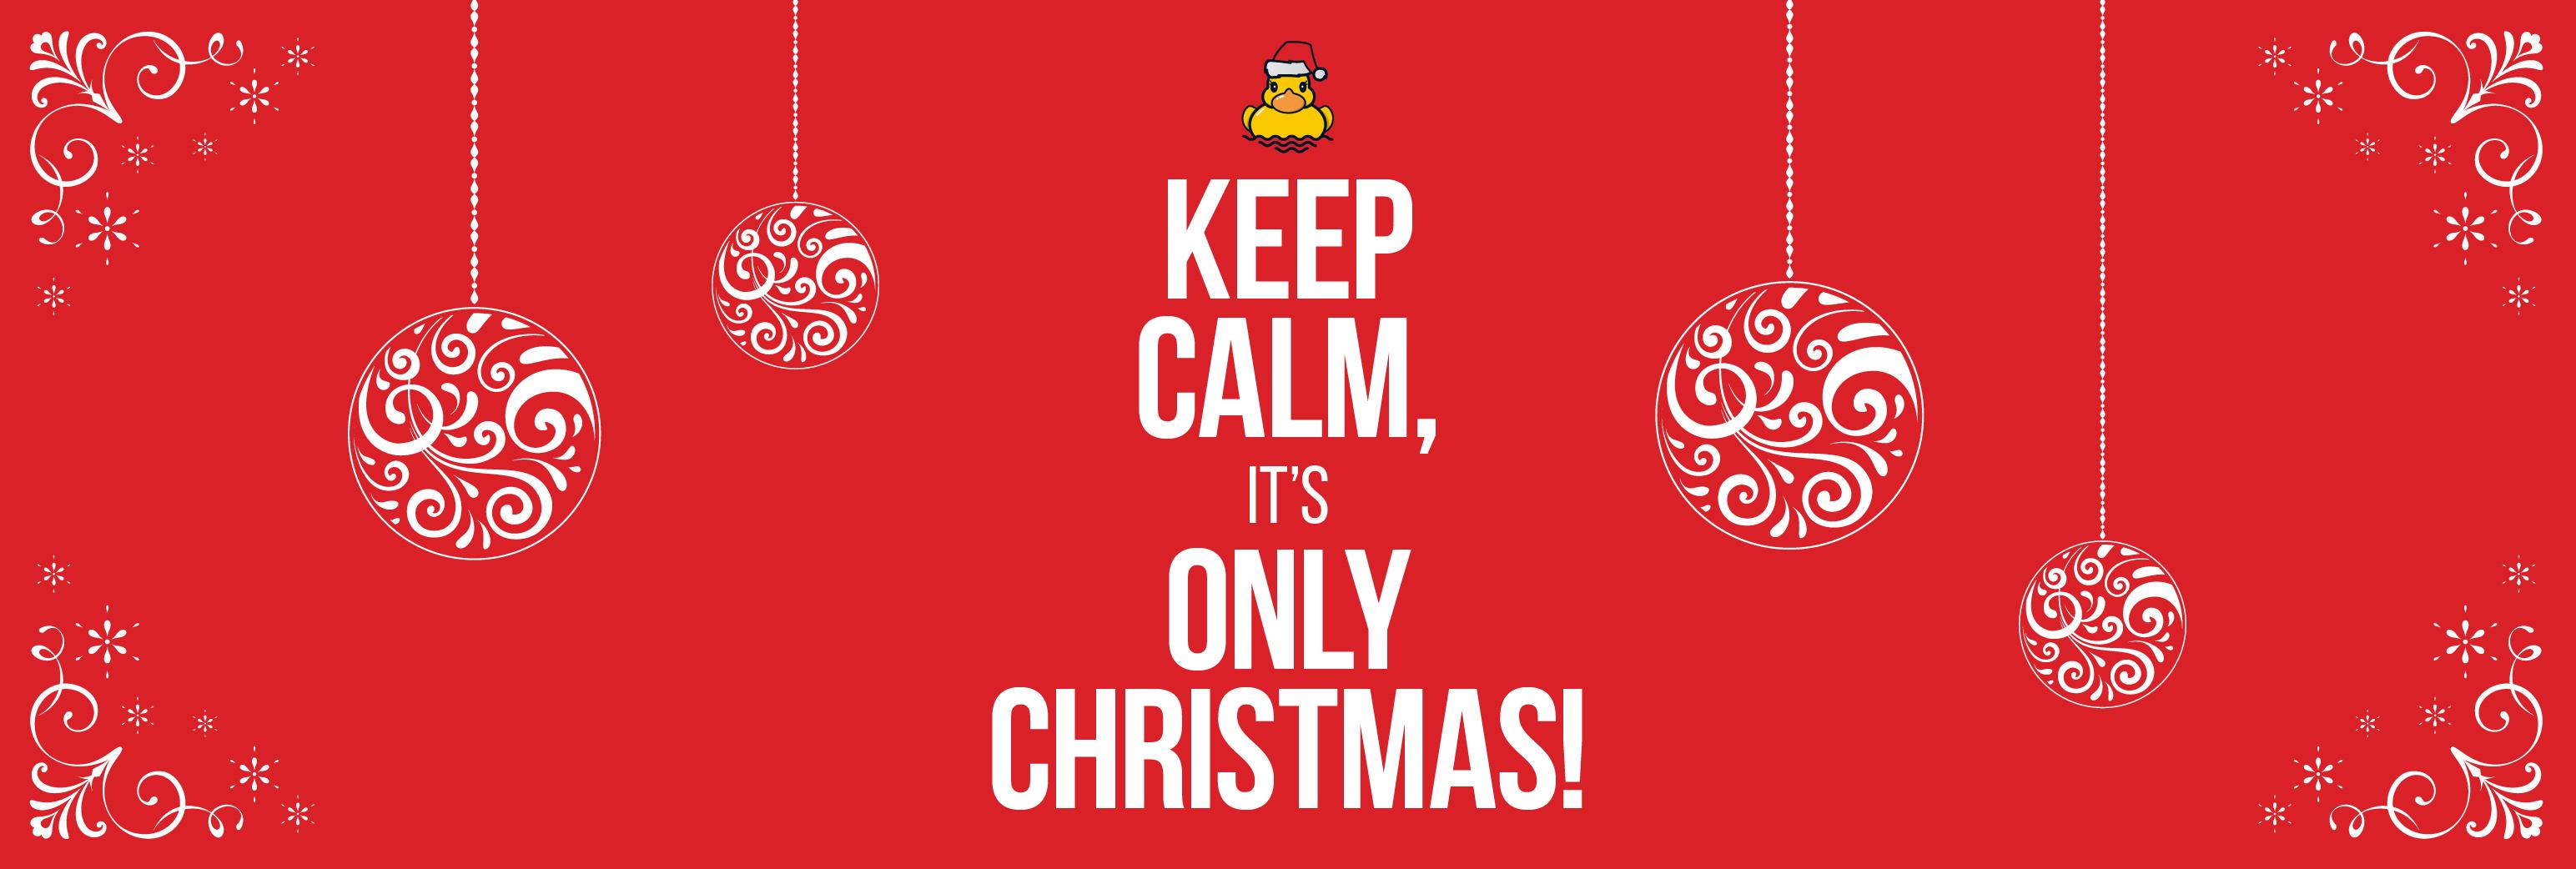 Keep calm, it\'s only Christmas! - Helen Deverell Communications